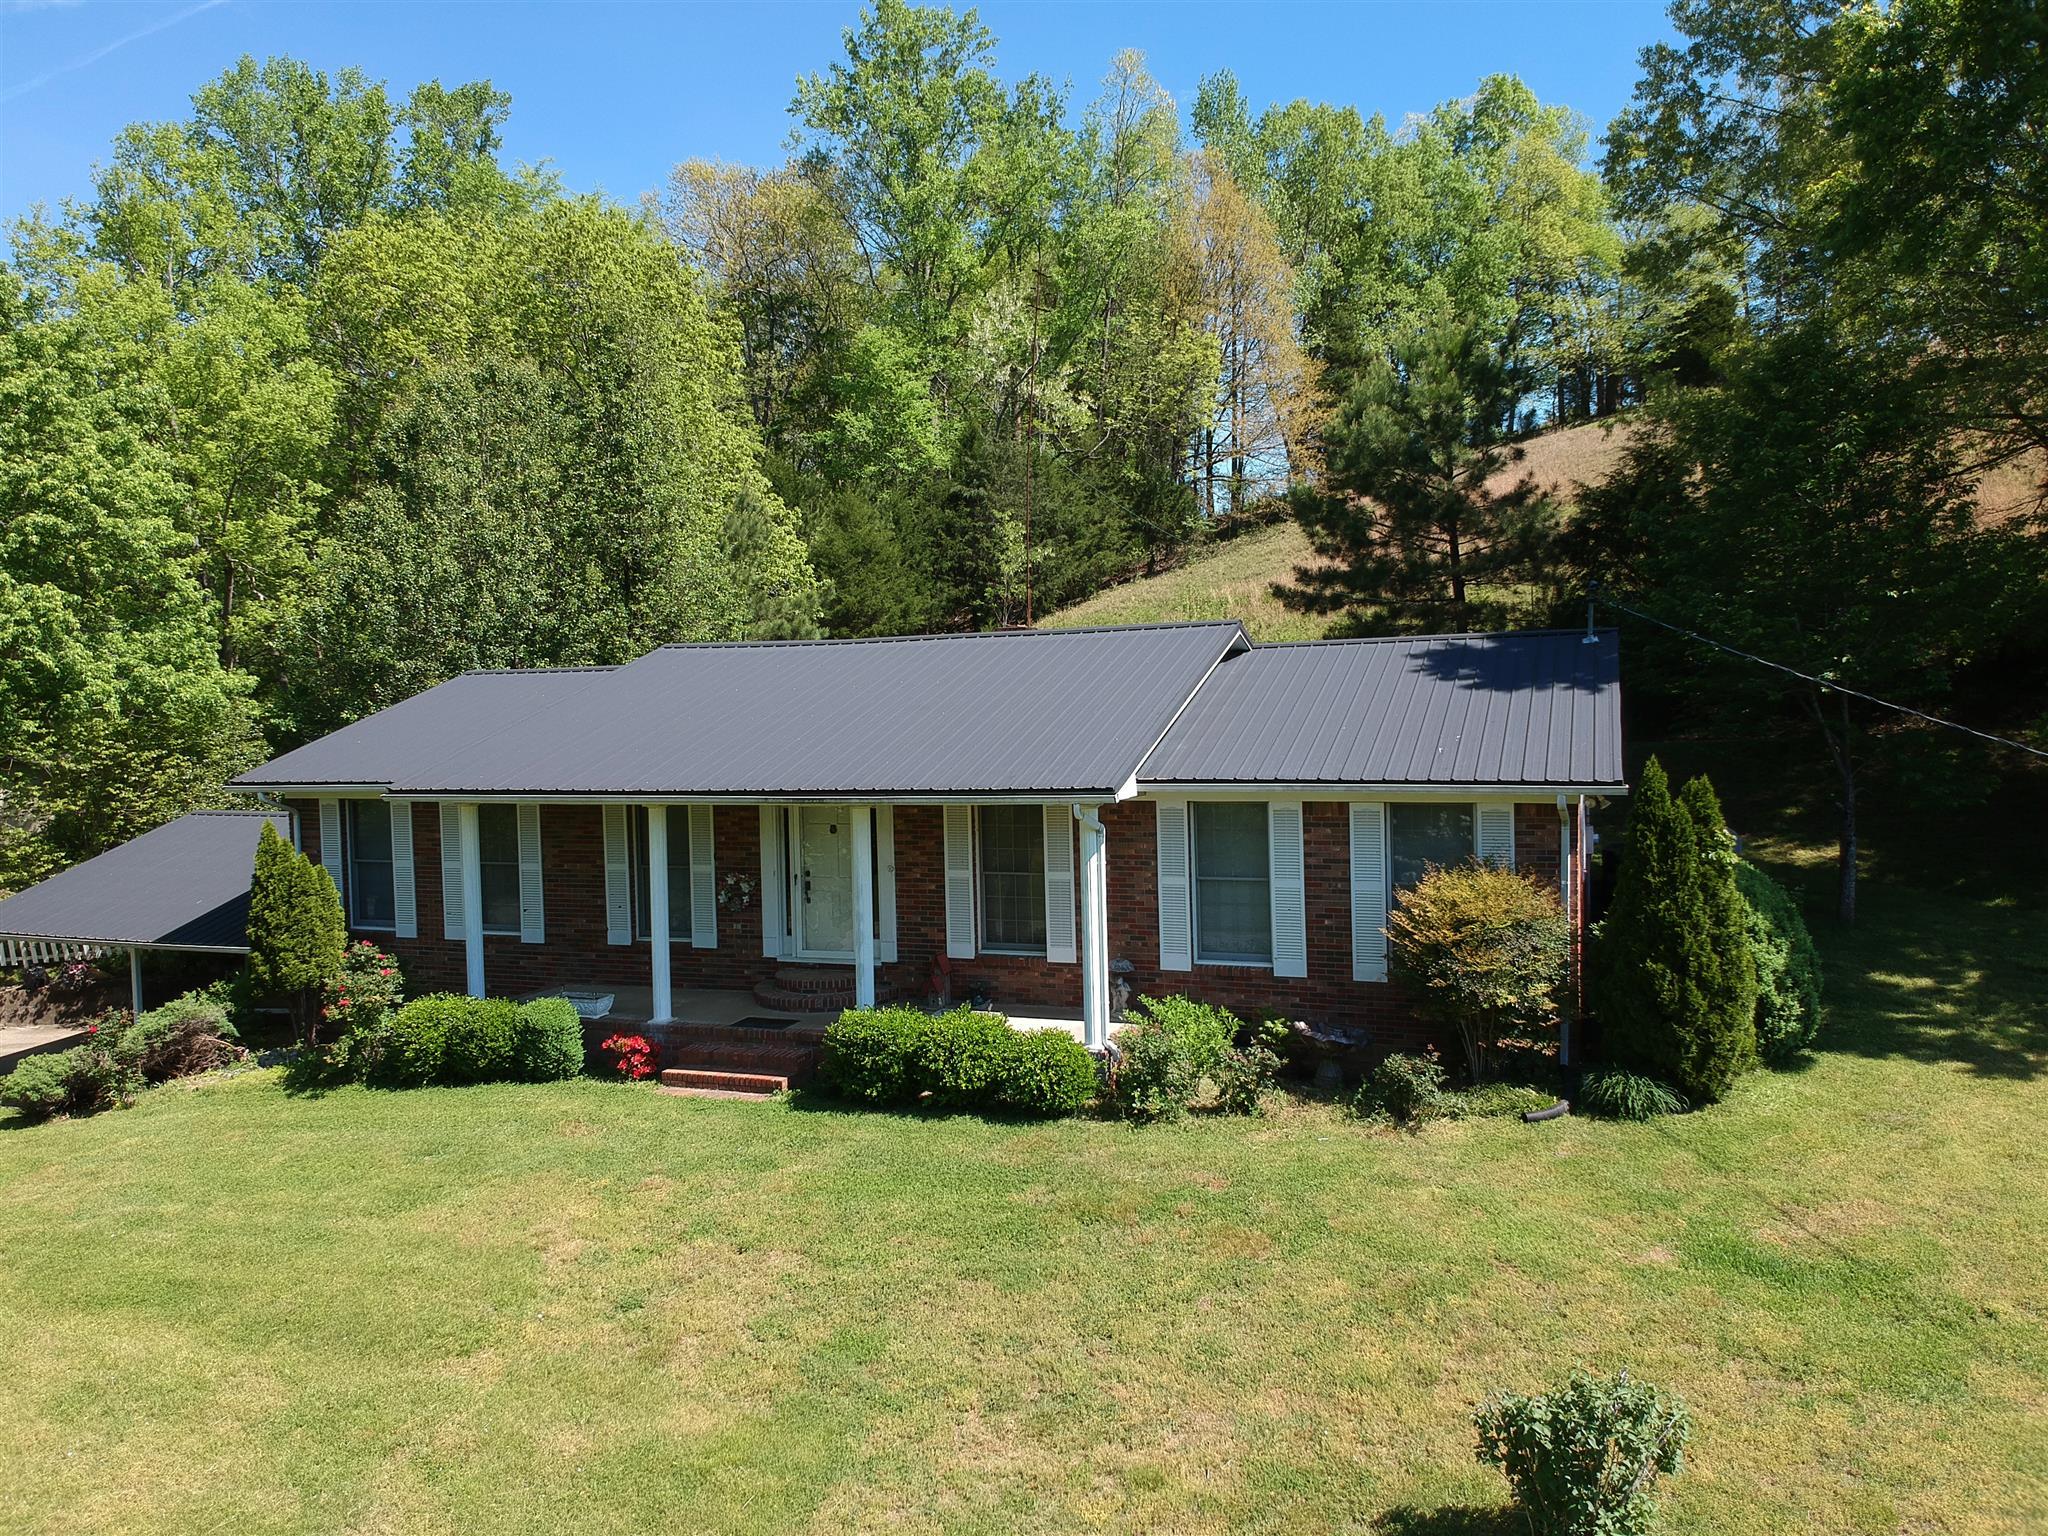 1300 Wray Branch Rd, Minor Hill, TN 38473 - Minor Hill, TN real estate listing